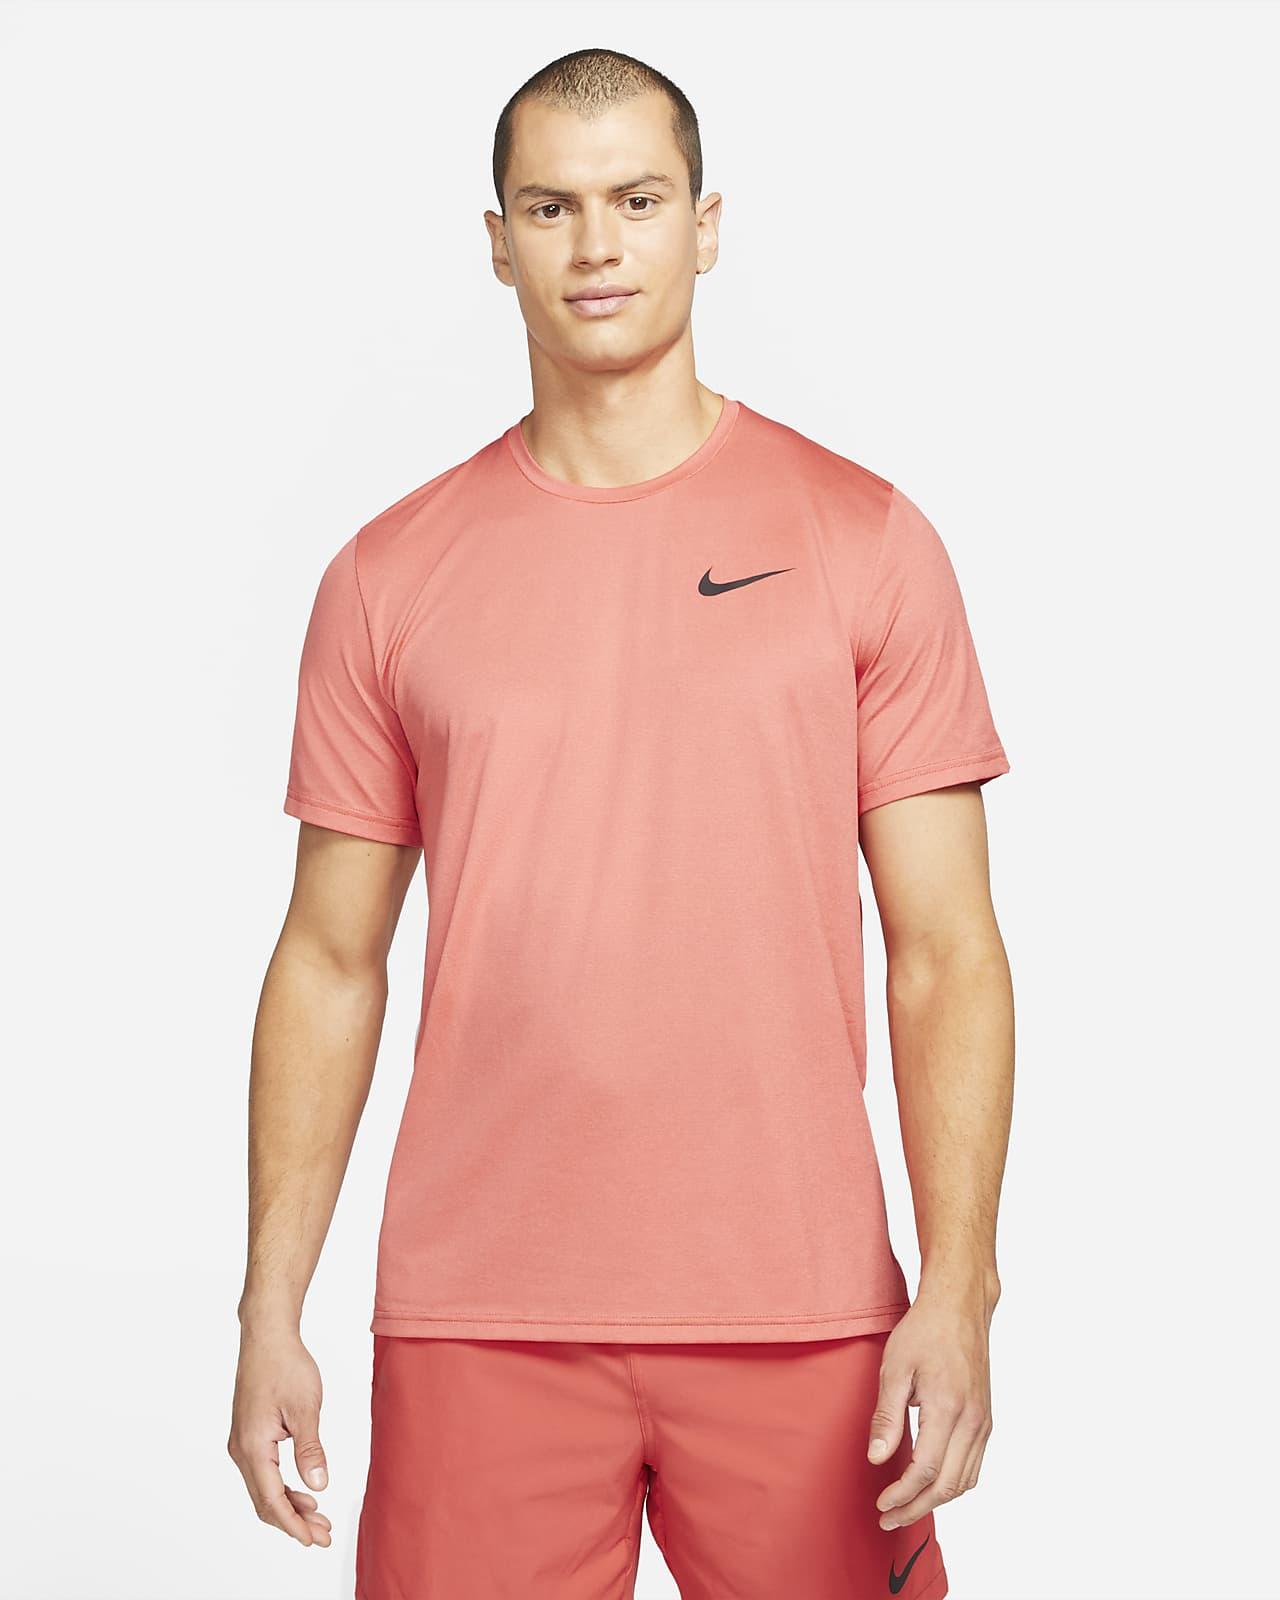 Nike Pro Dri-FIT Kısa Kollu Erkek Üstü